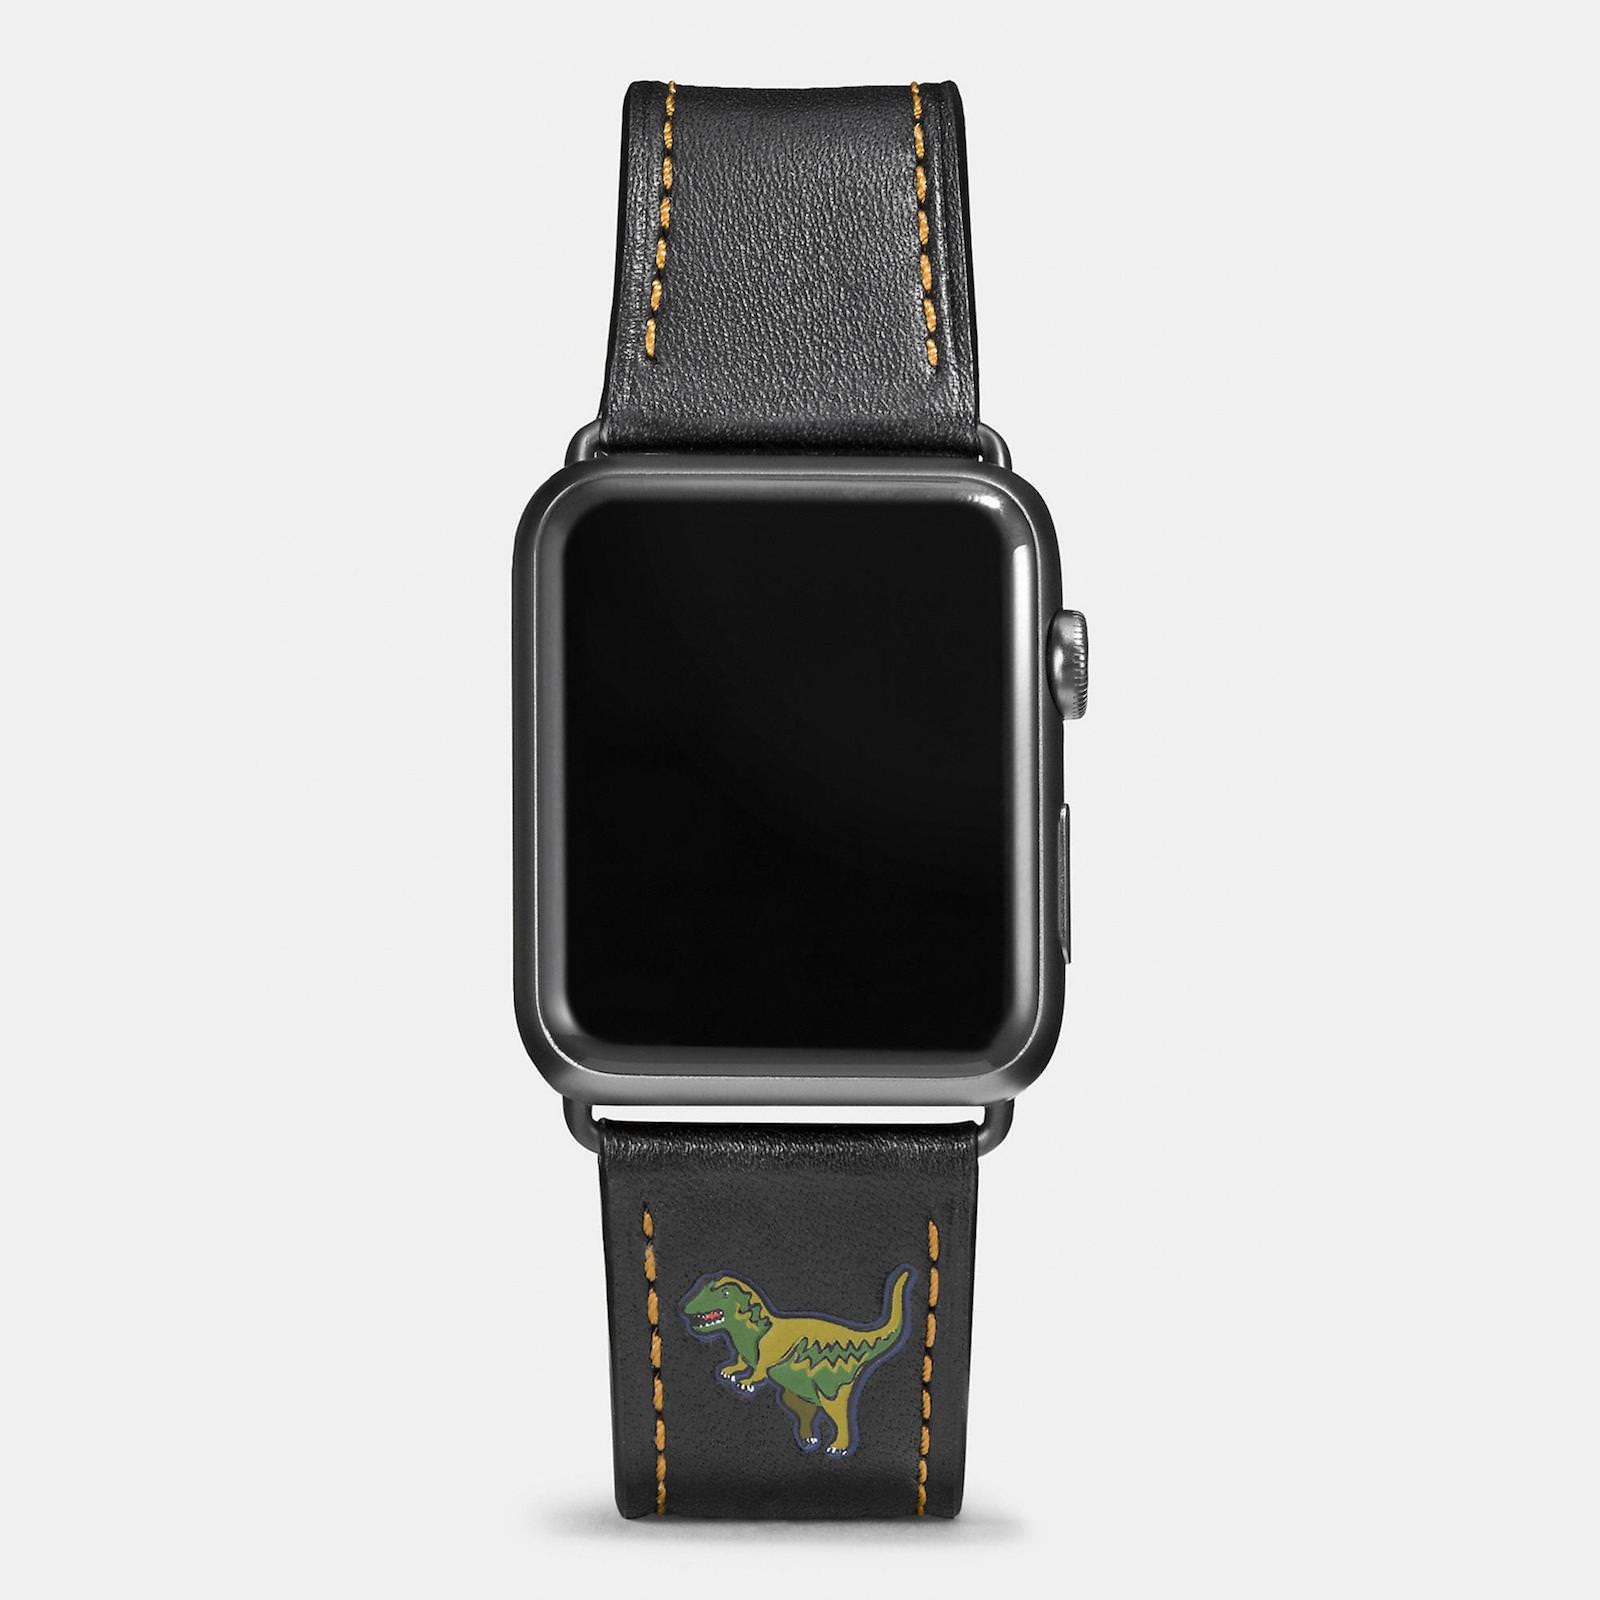 Apple-Watch-Coach-Band-Autumn-Season-8.jpeg